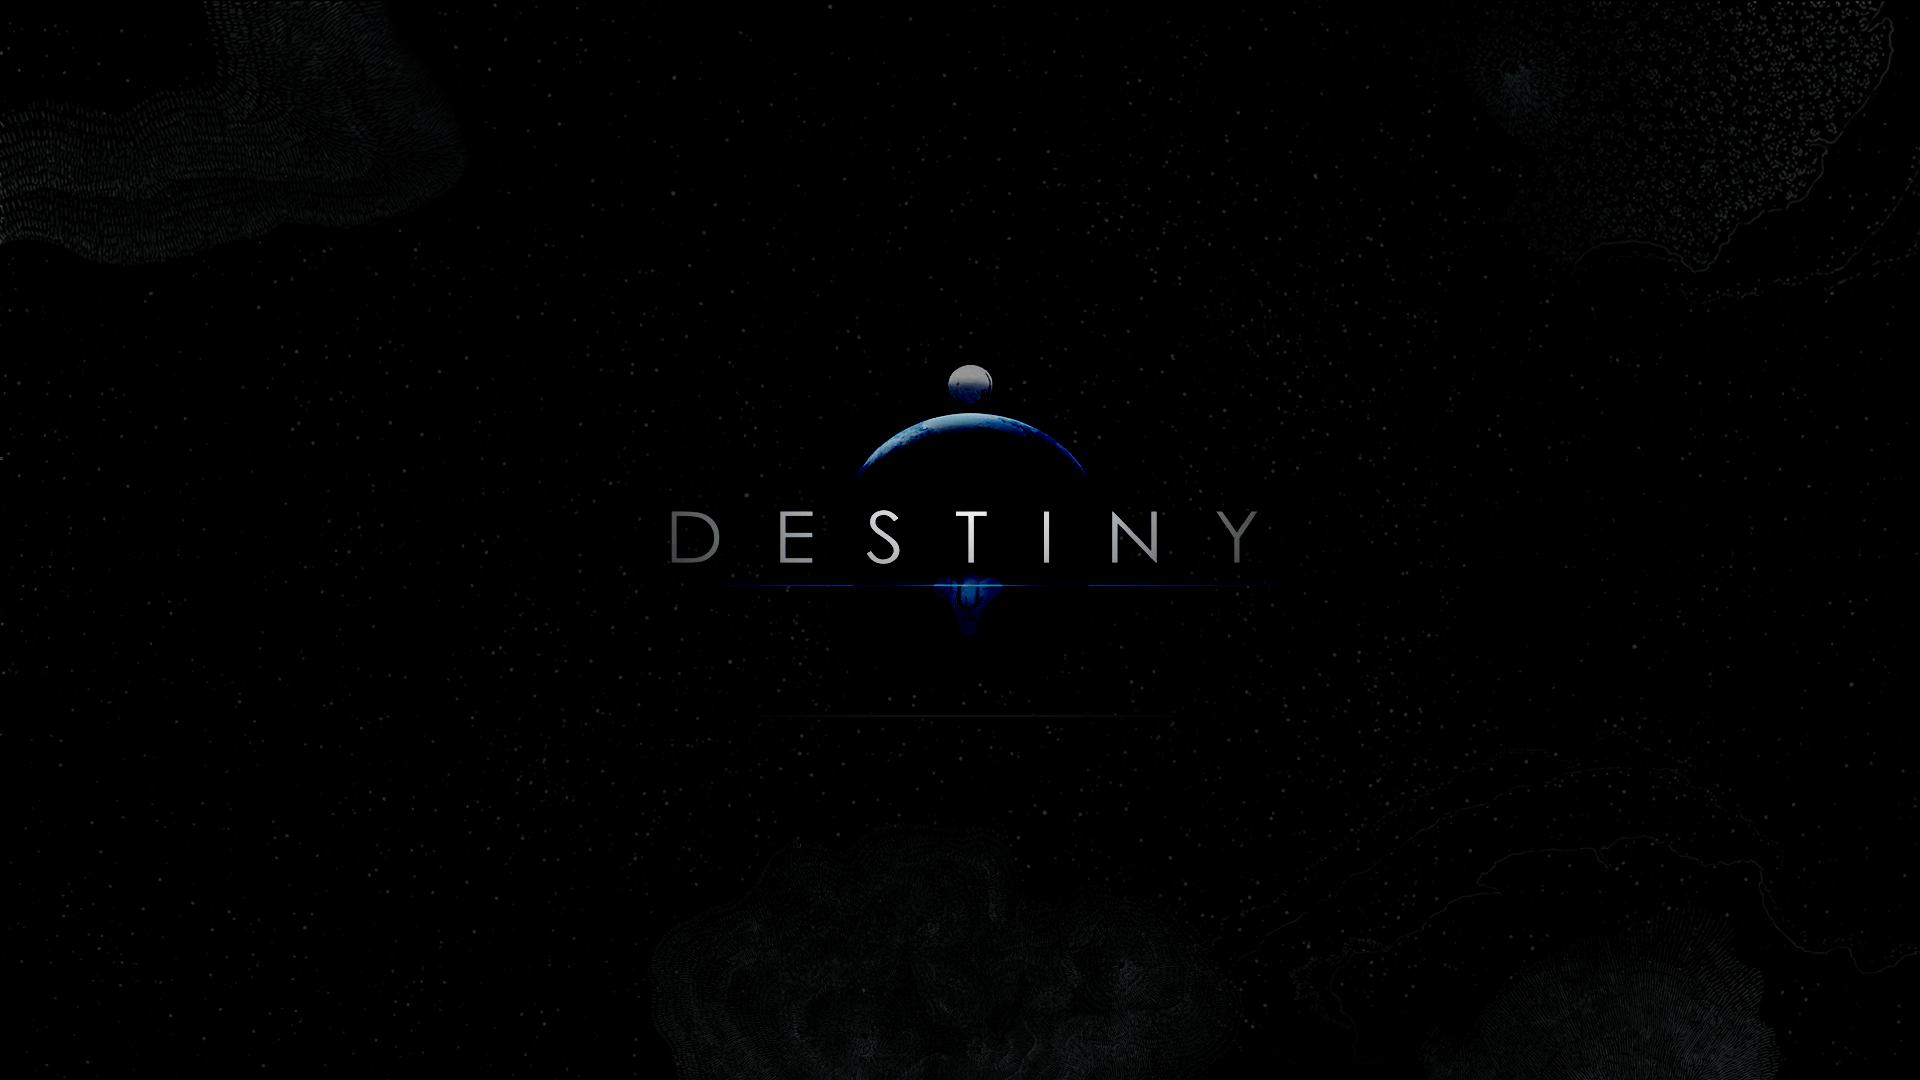 destiny logo hd - photo #17